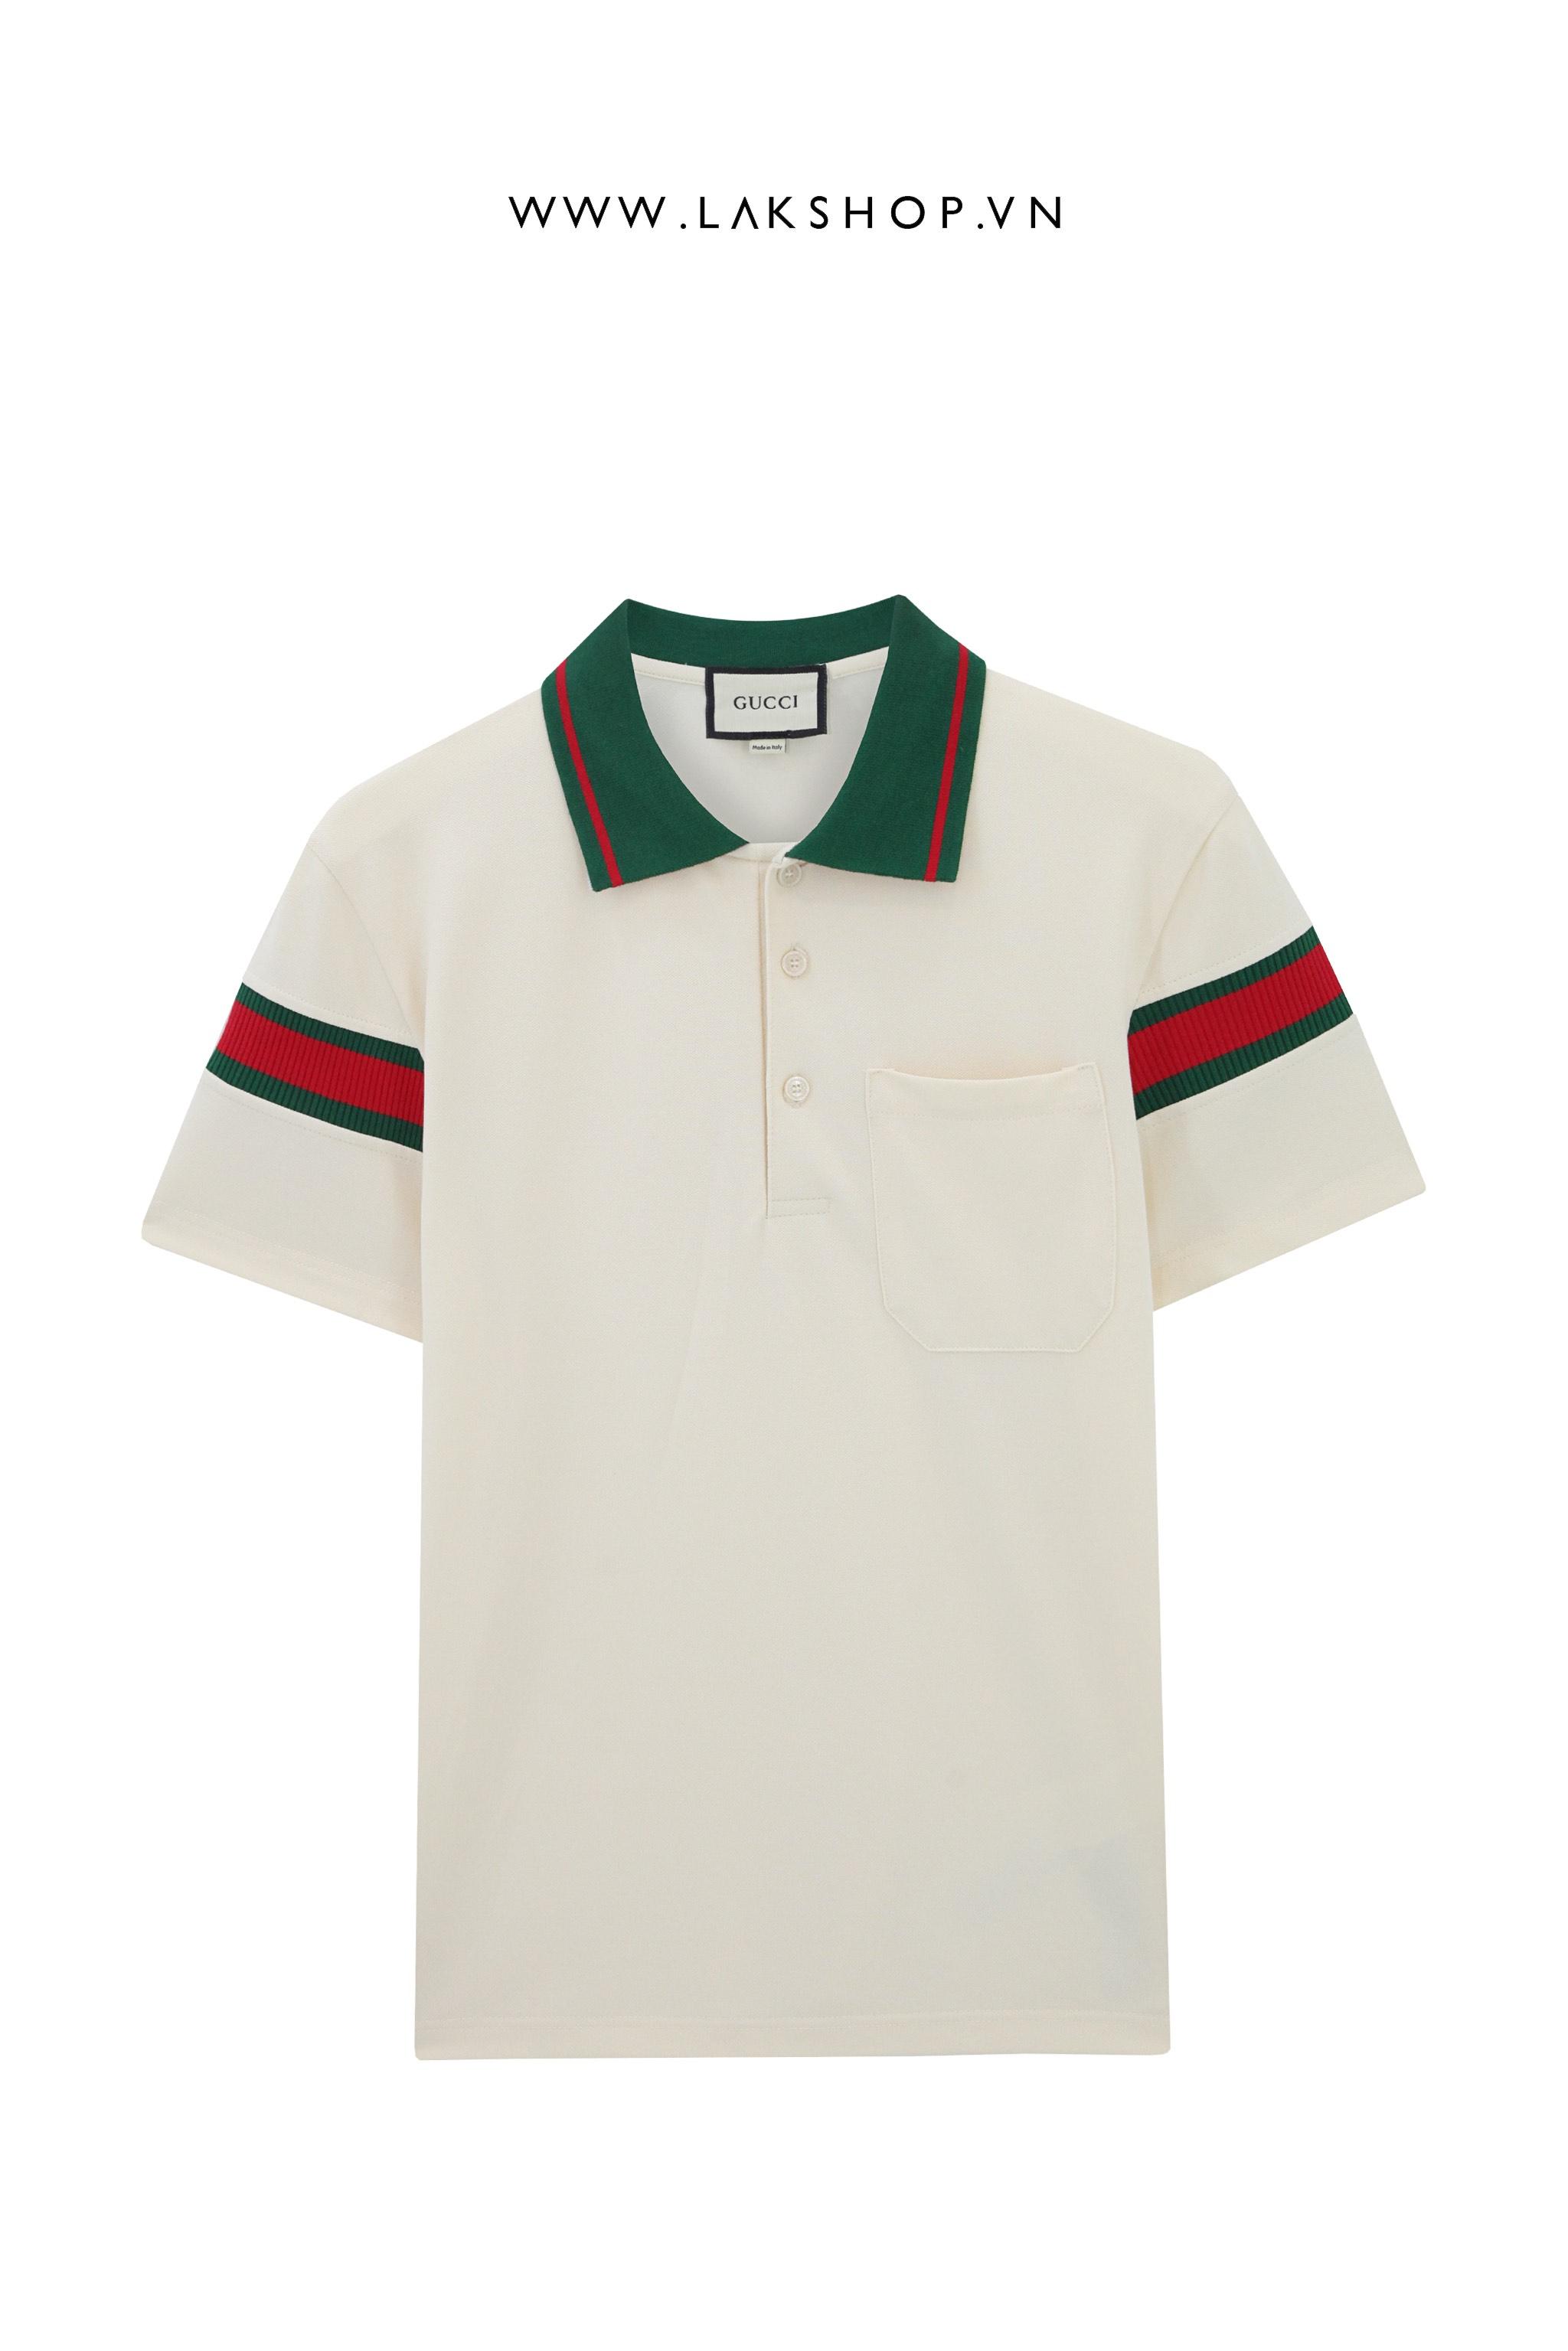 Louis Vuitton Monogram 3D Logo Black  Shirt